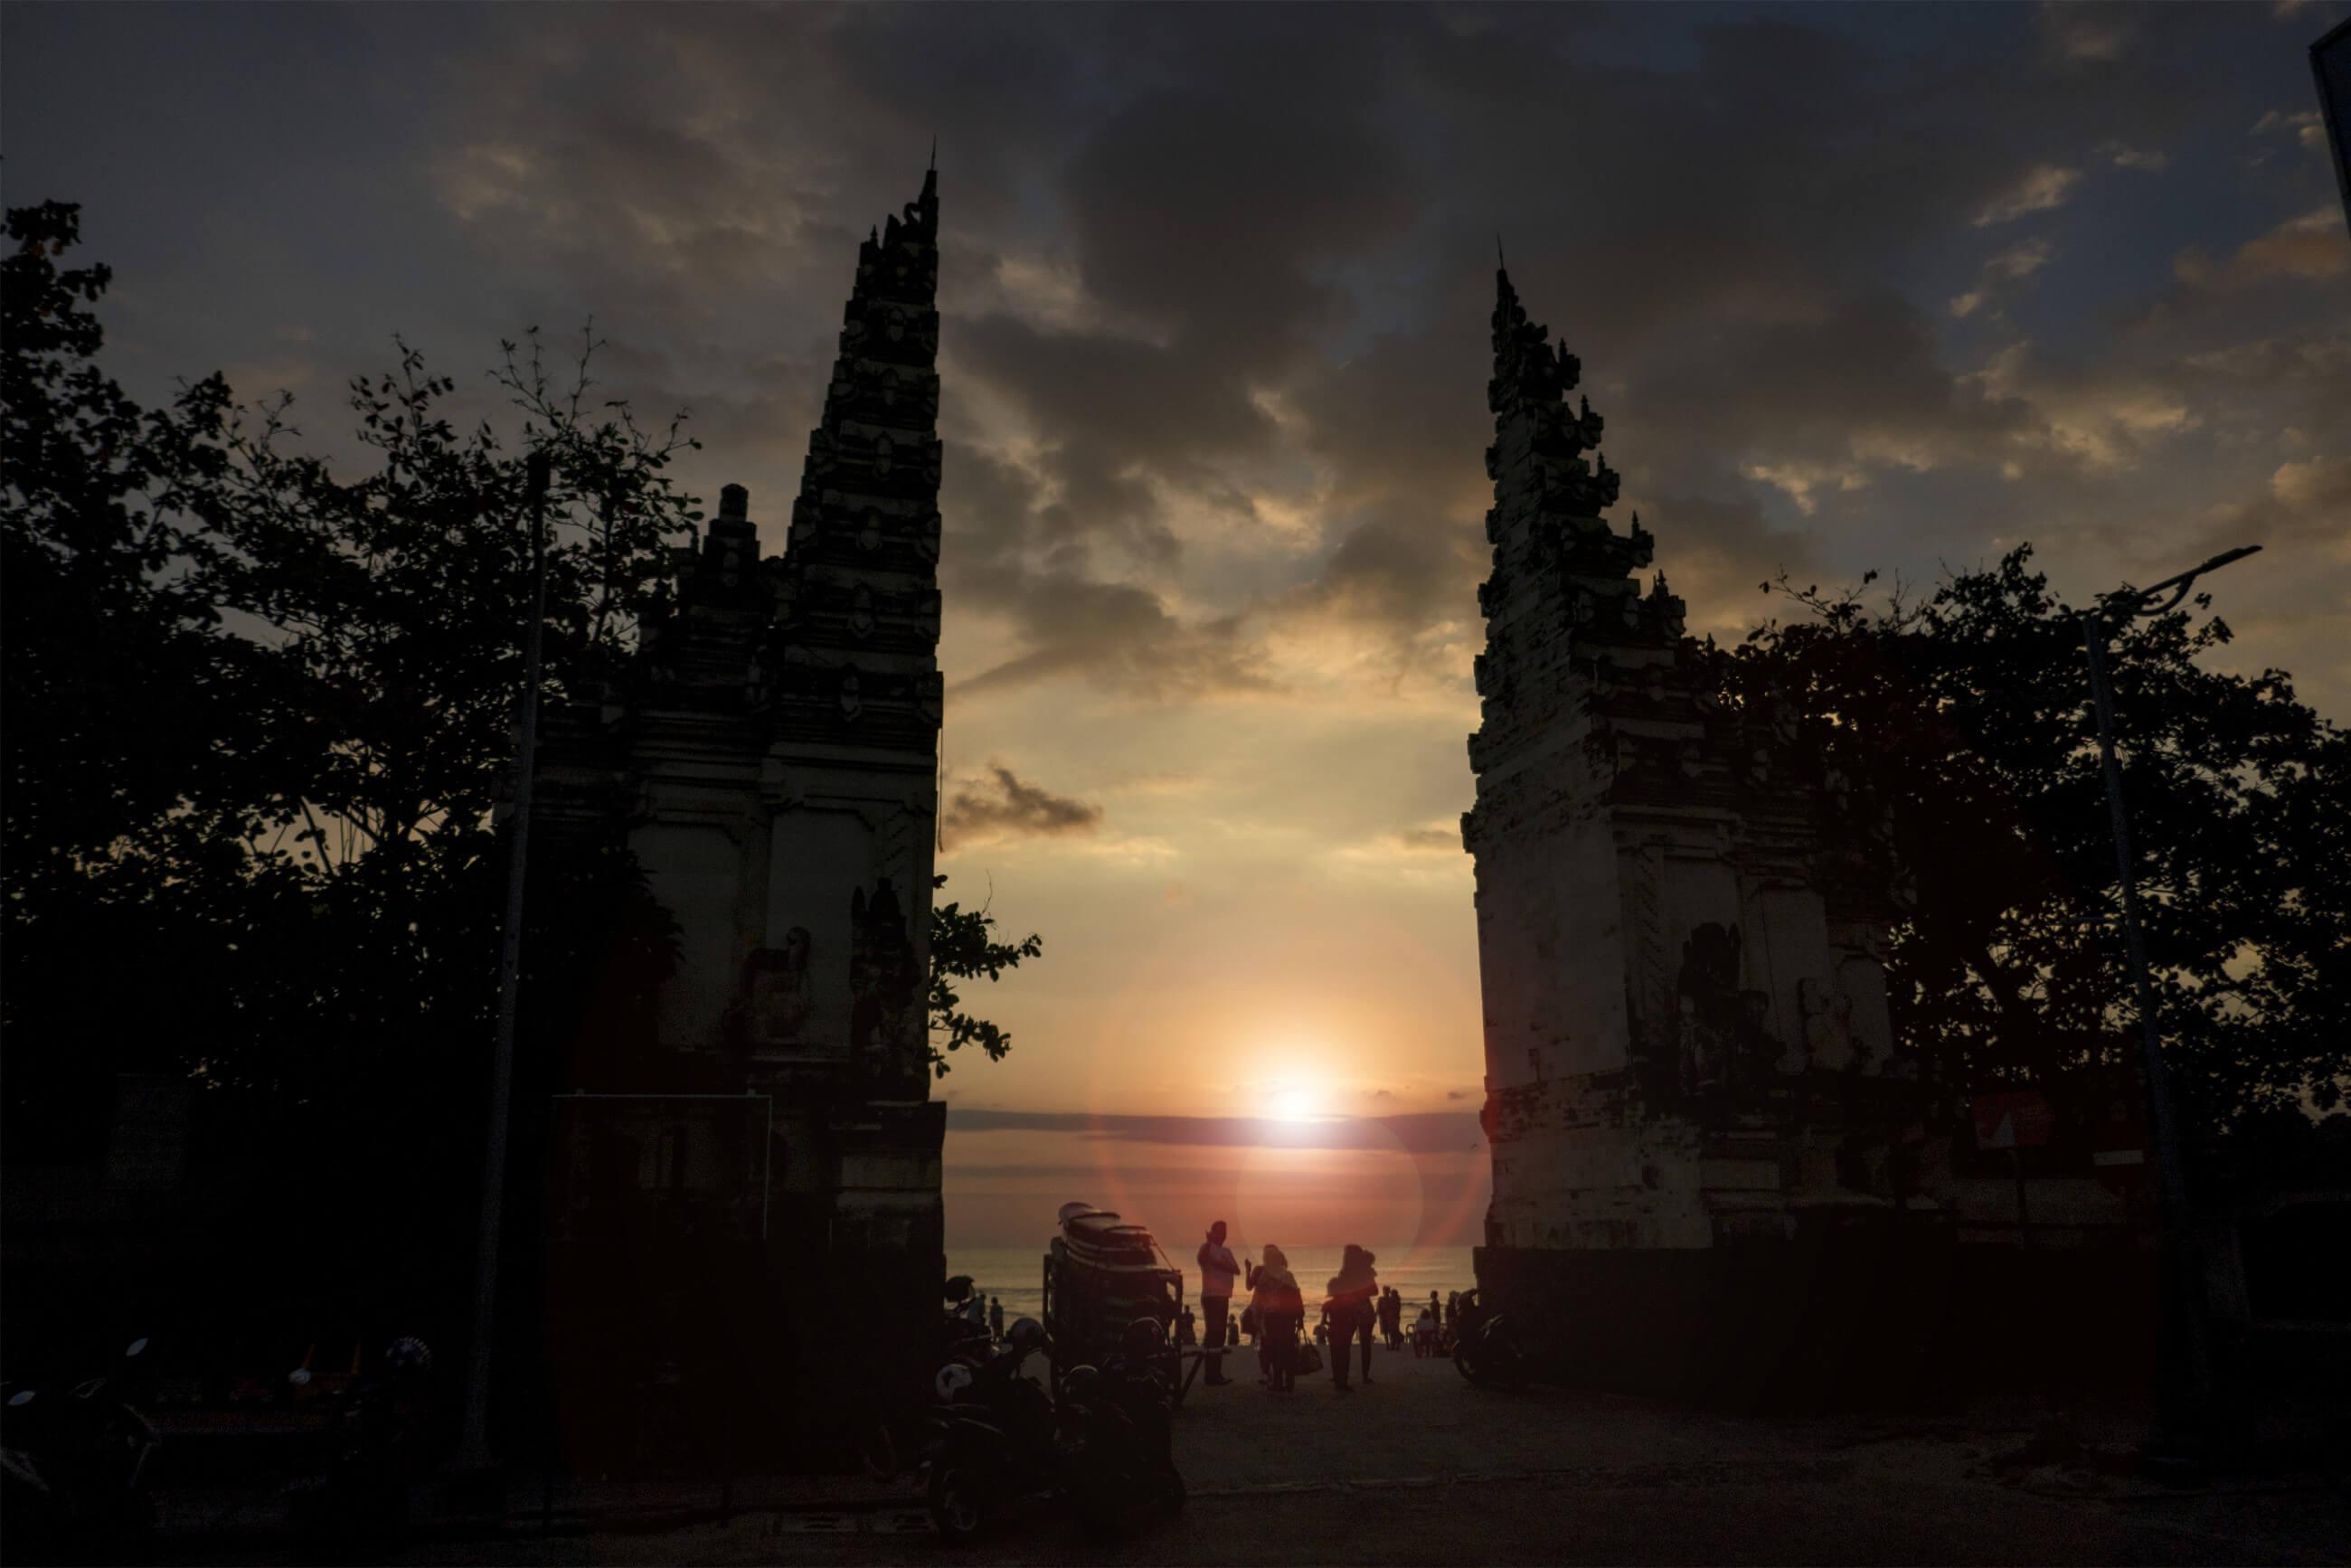 https://bubo.sk/uploads/galleries/7304/martinsimko_indonezia_klf_p1050582-flare.jpg